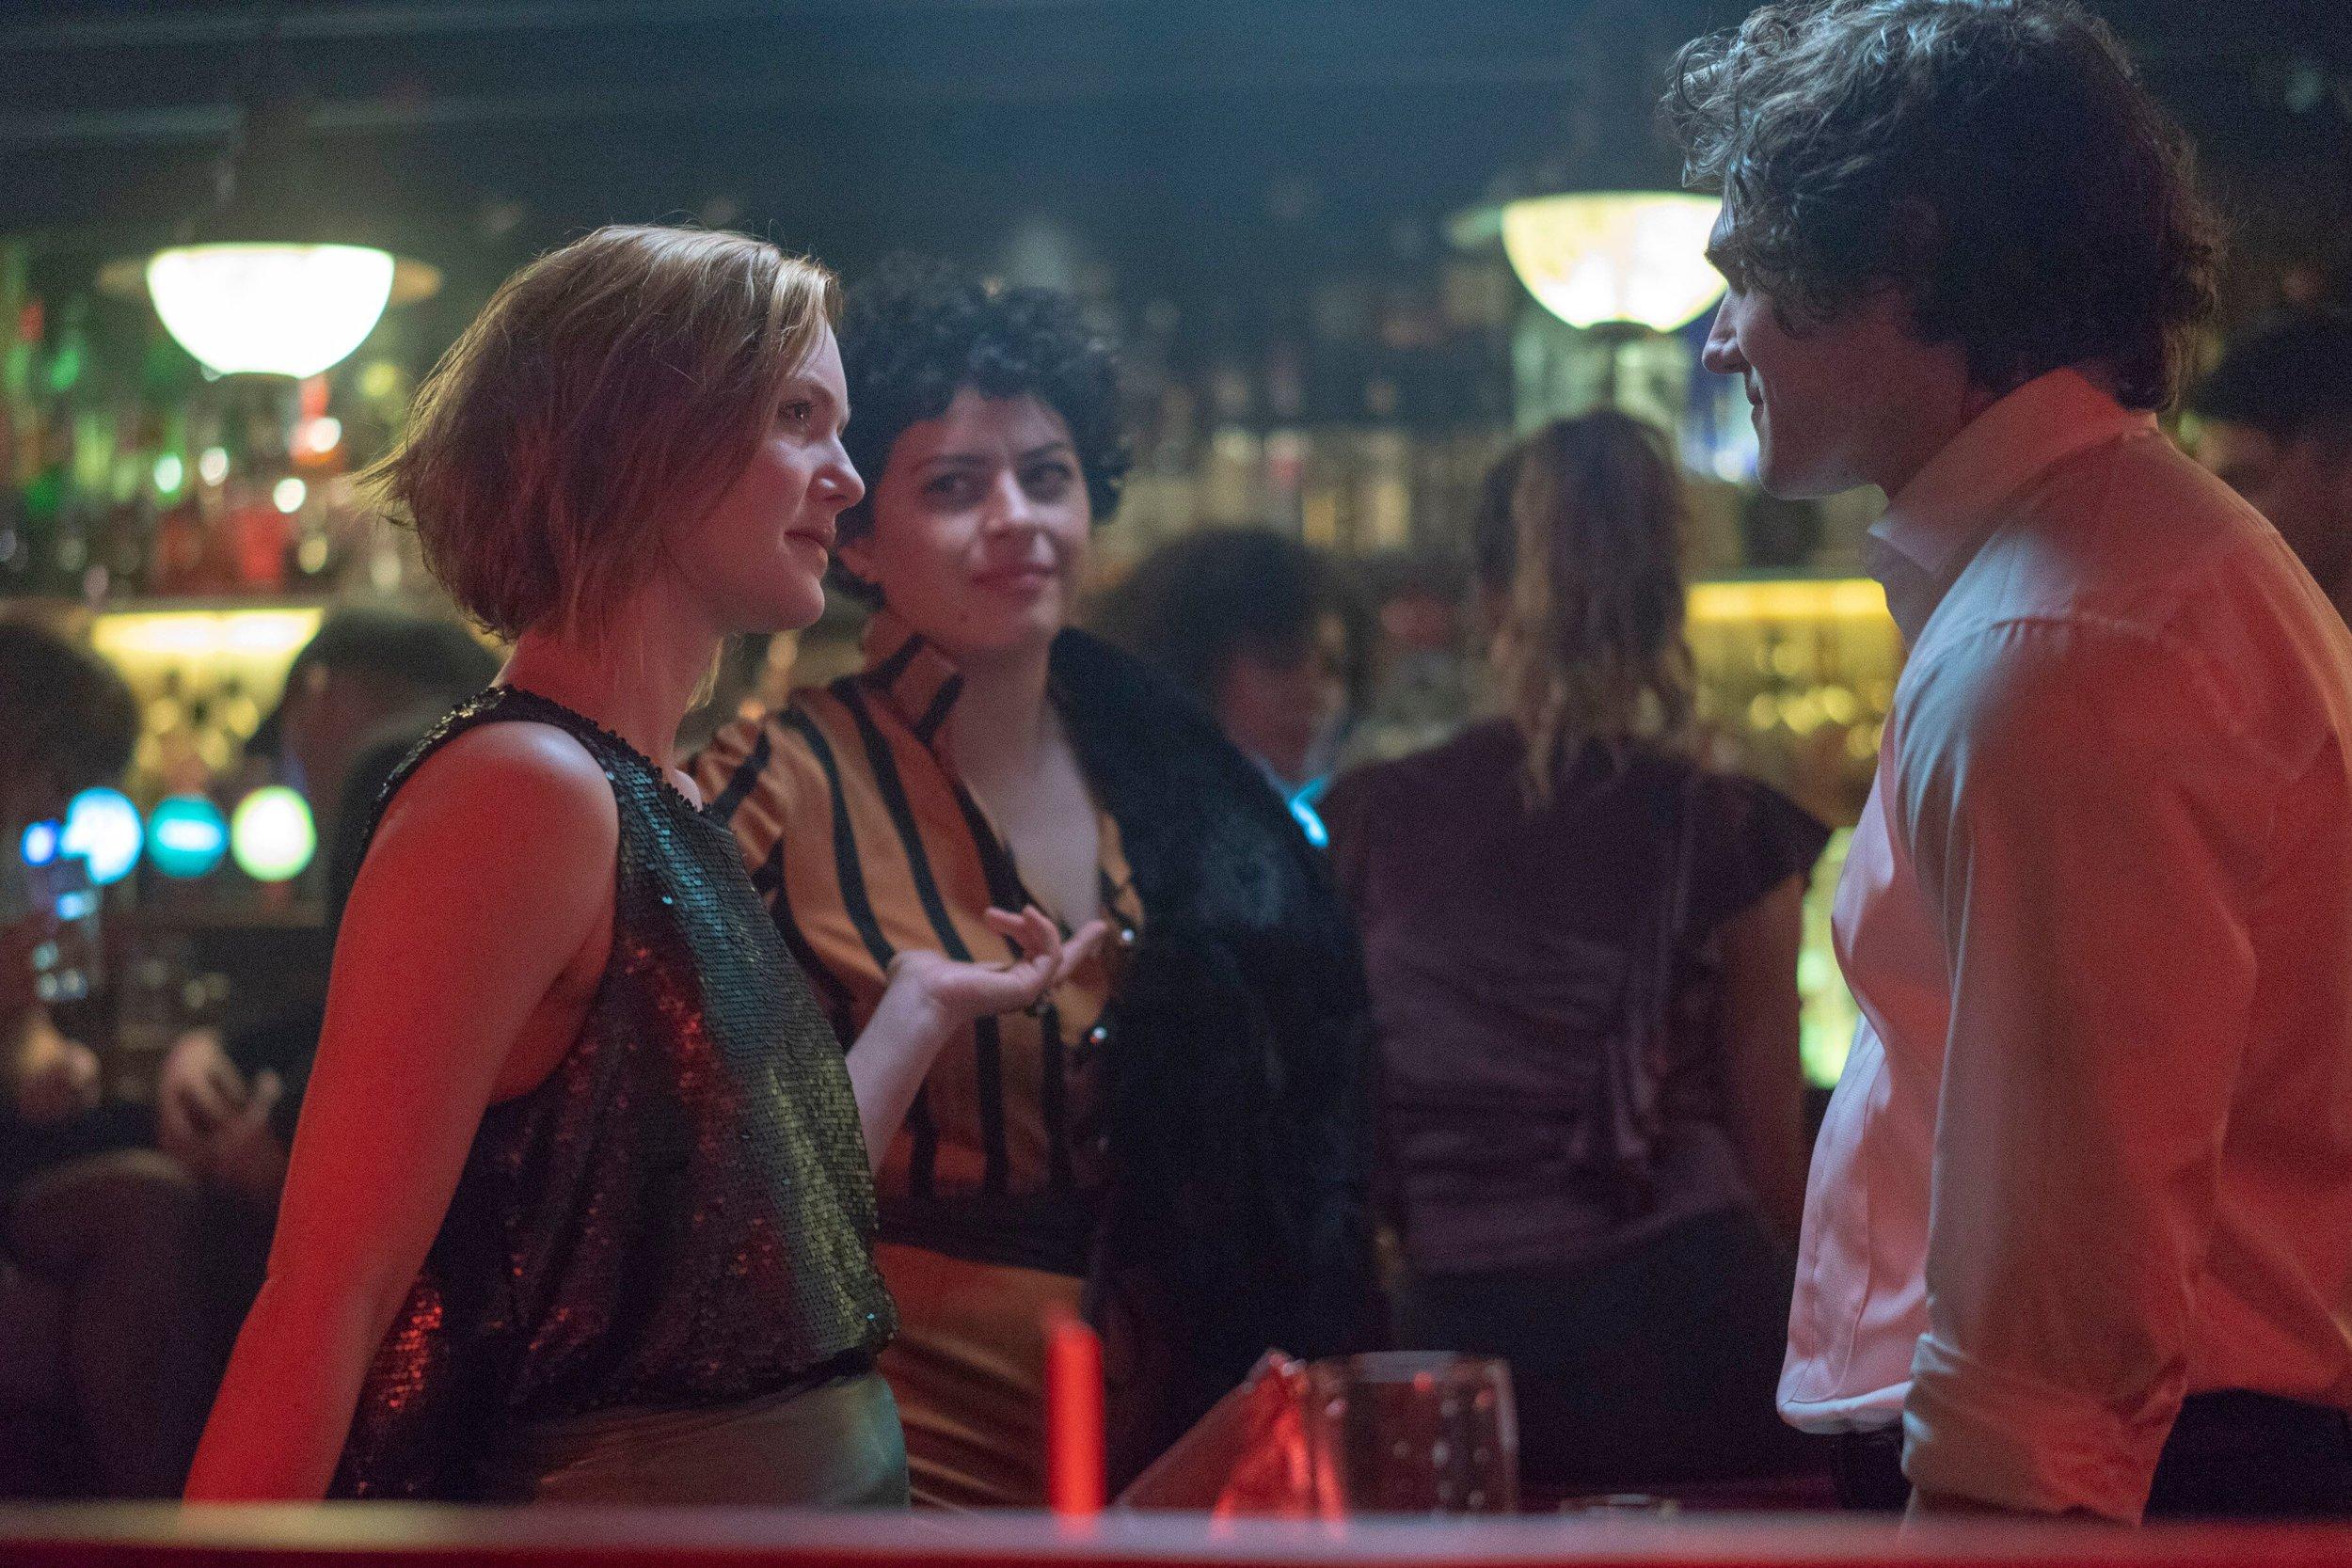 Sophie Hyde - 'Animals' opens in Australian cinemas Sept 12.